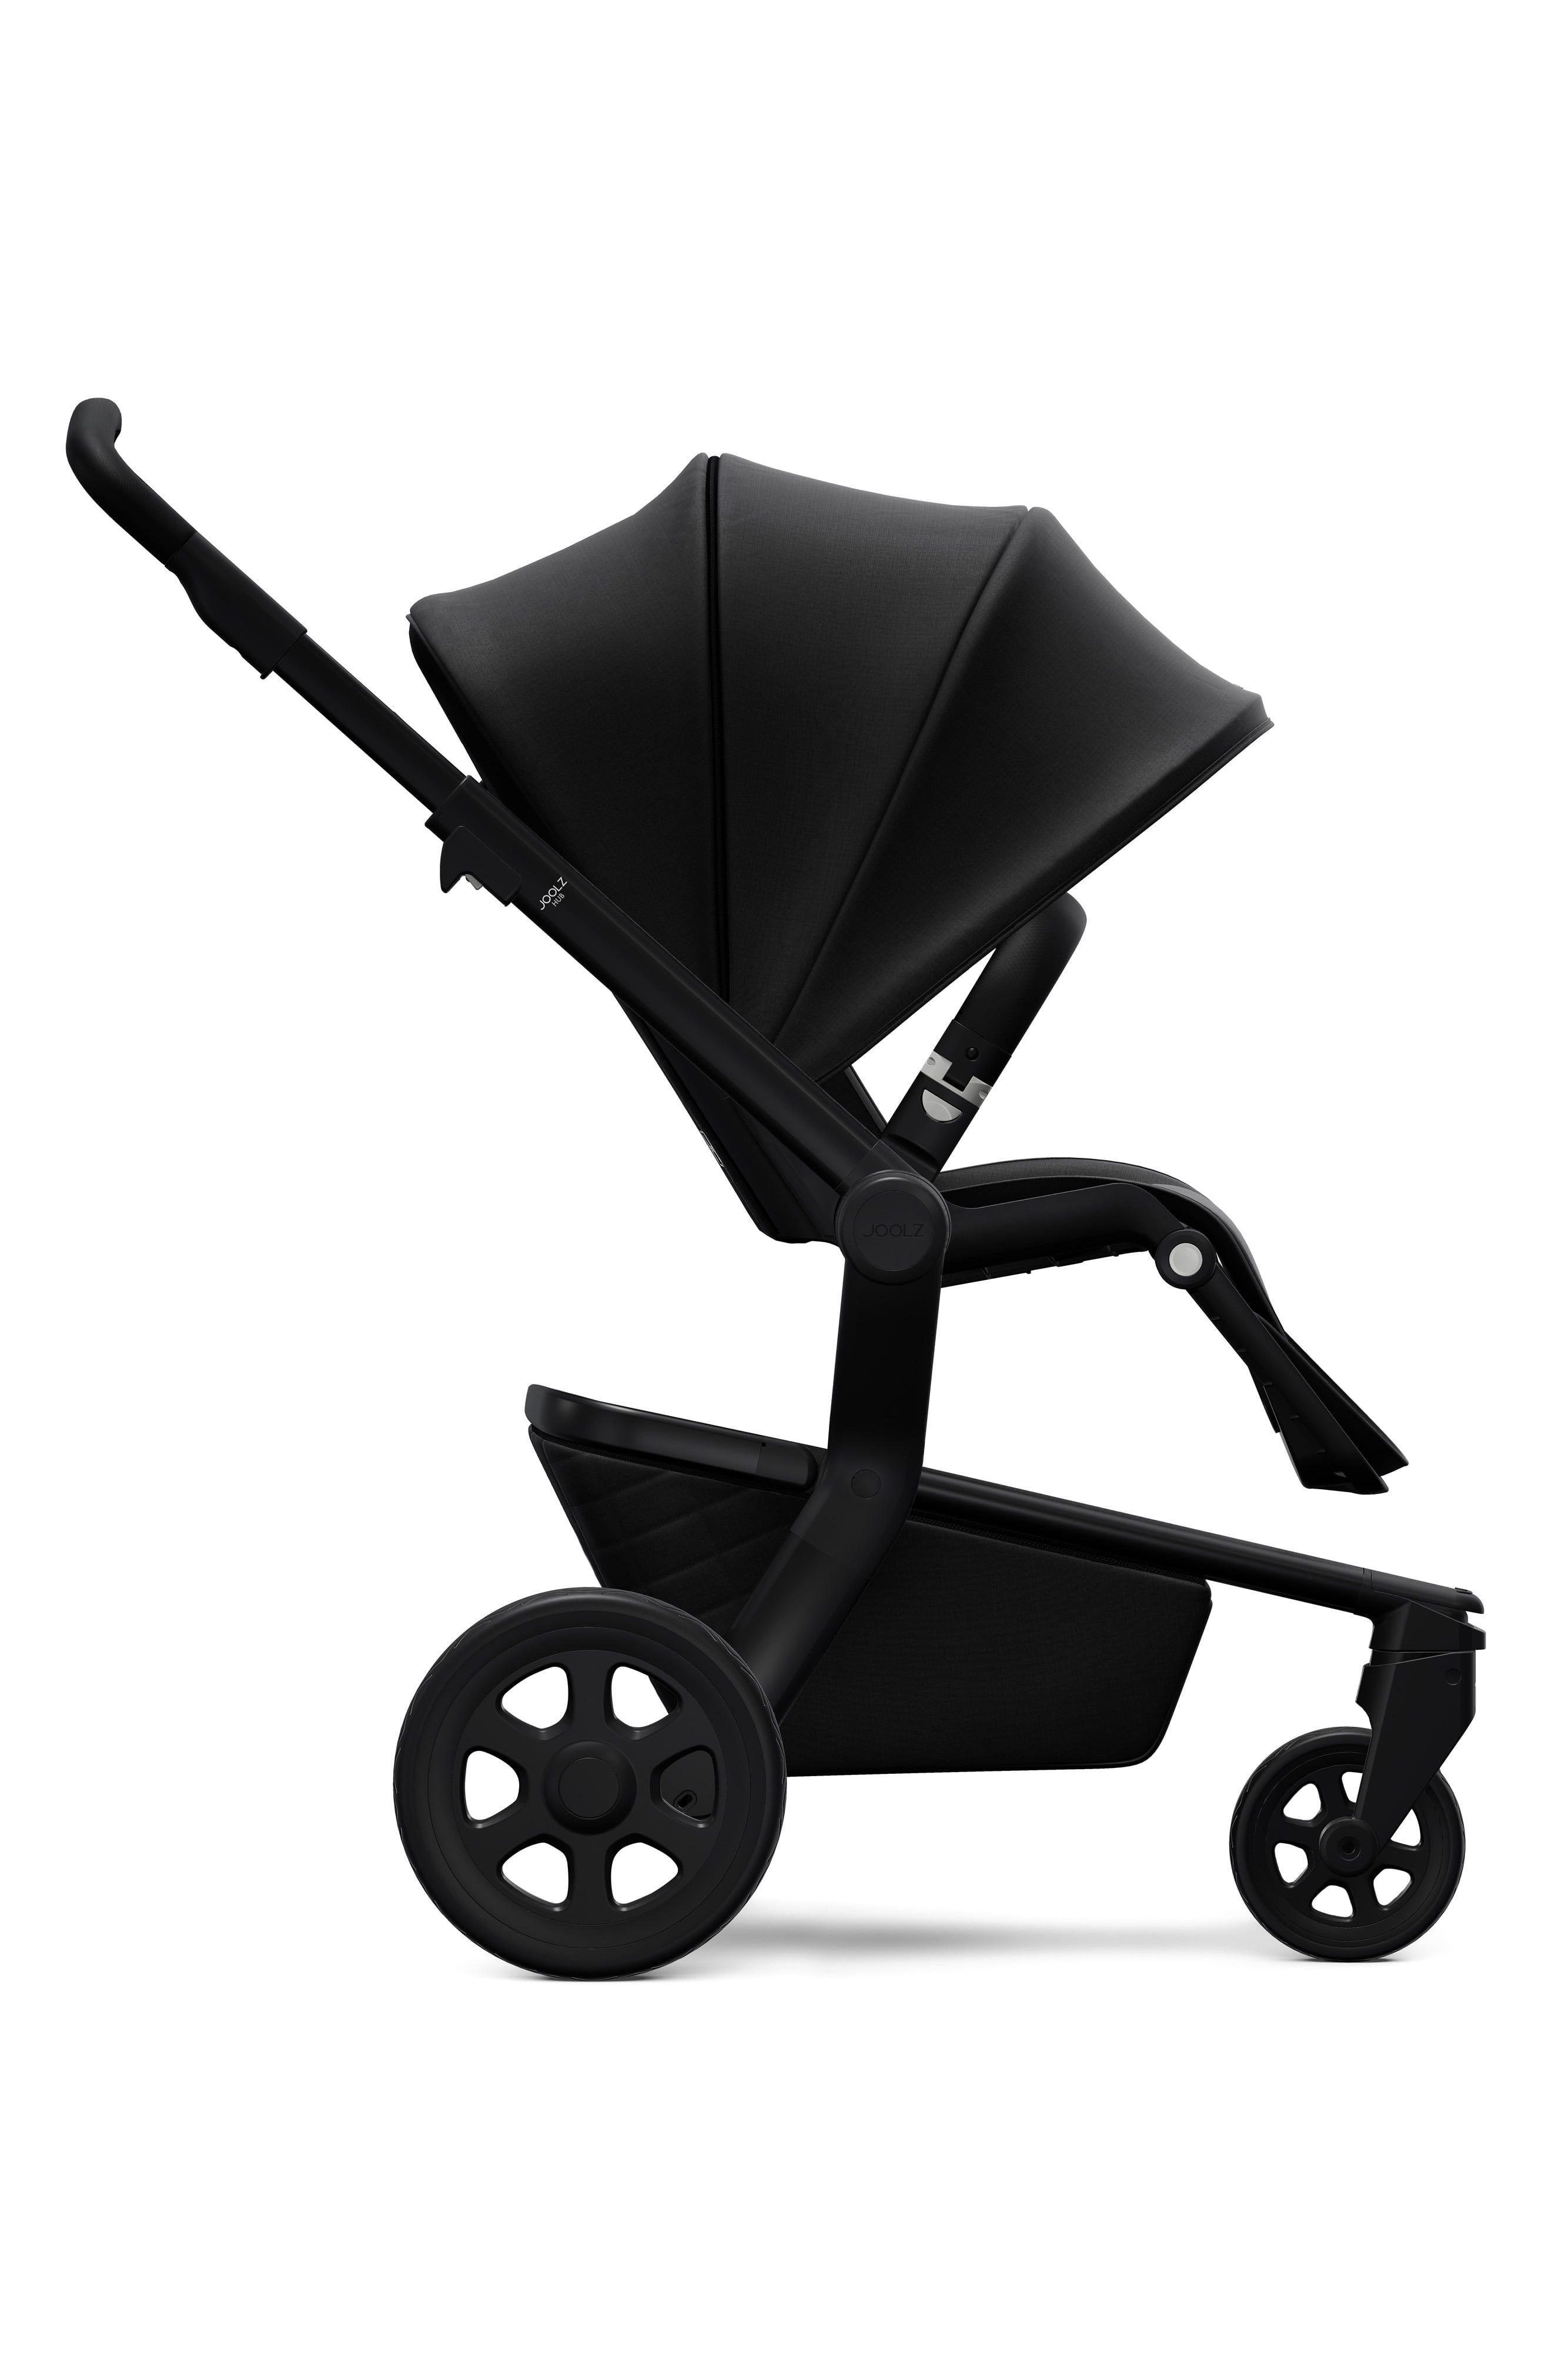 14+ Joolz hub stroller weight ideas